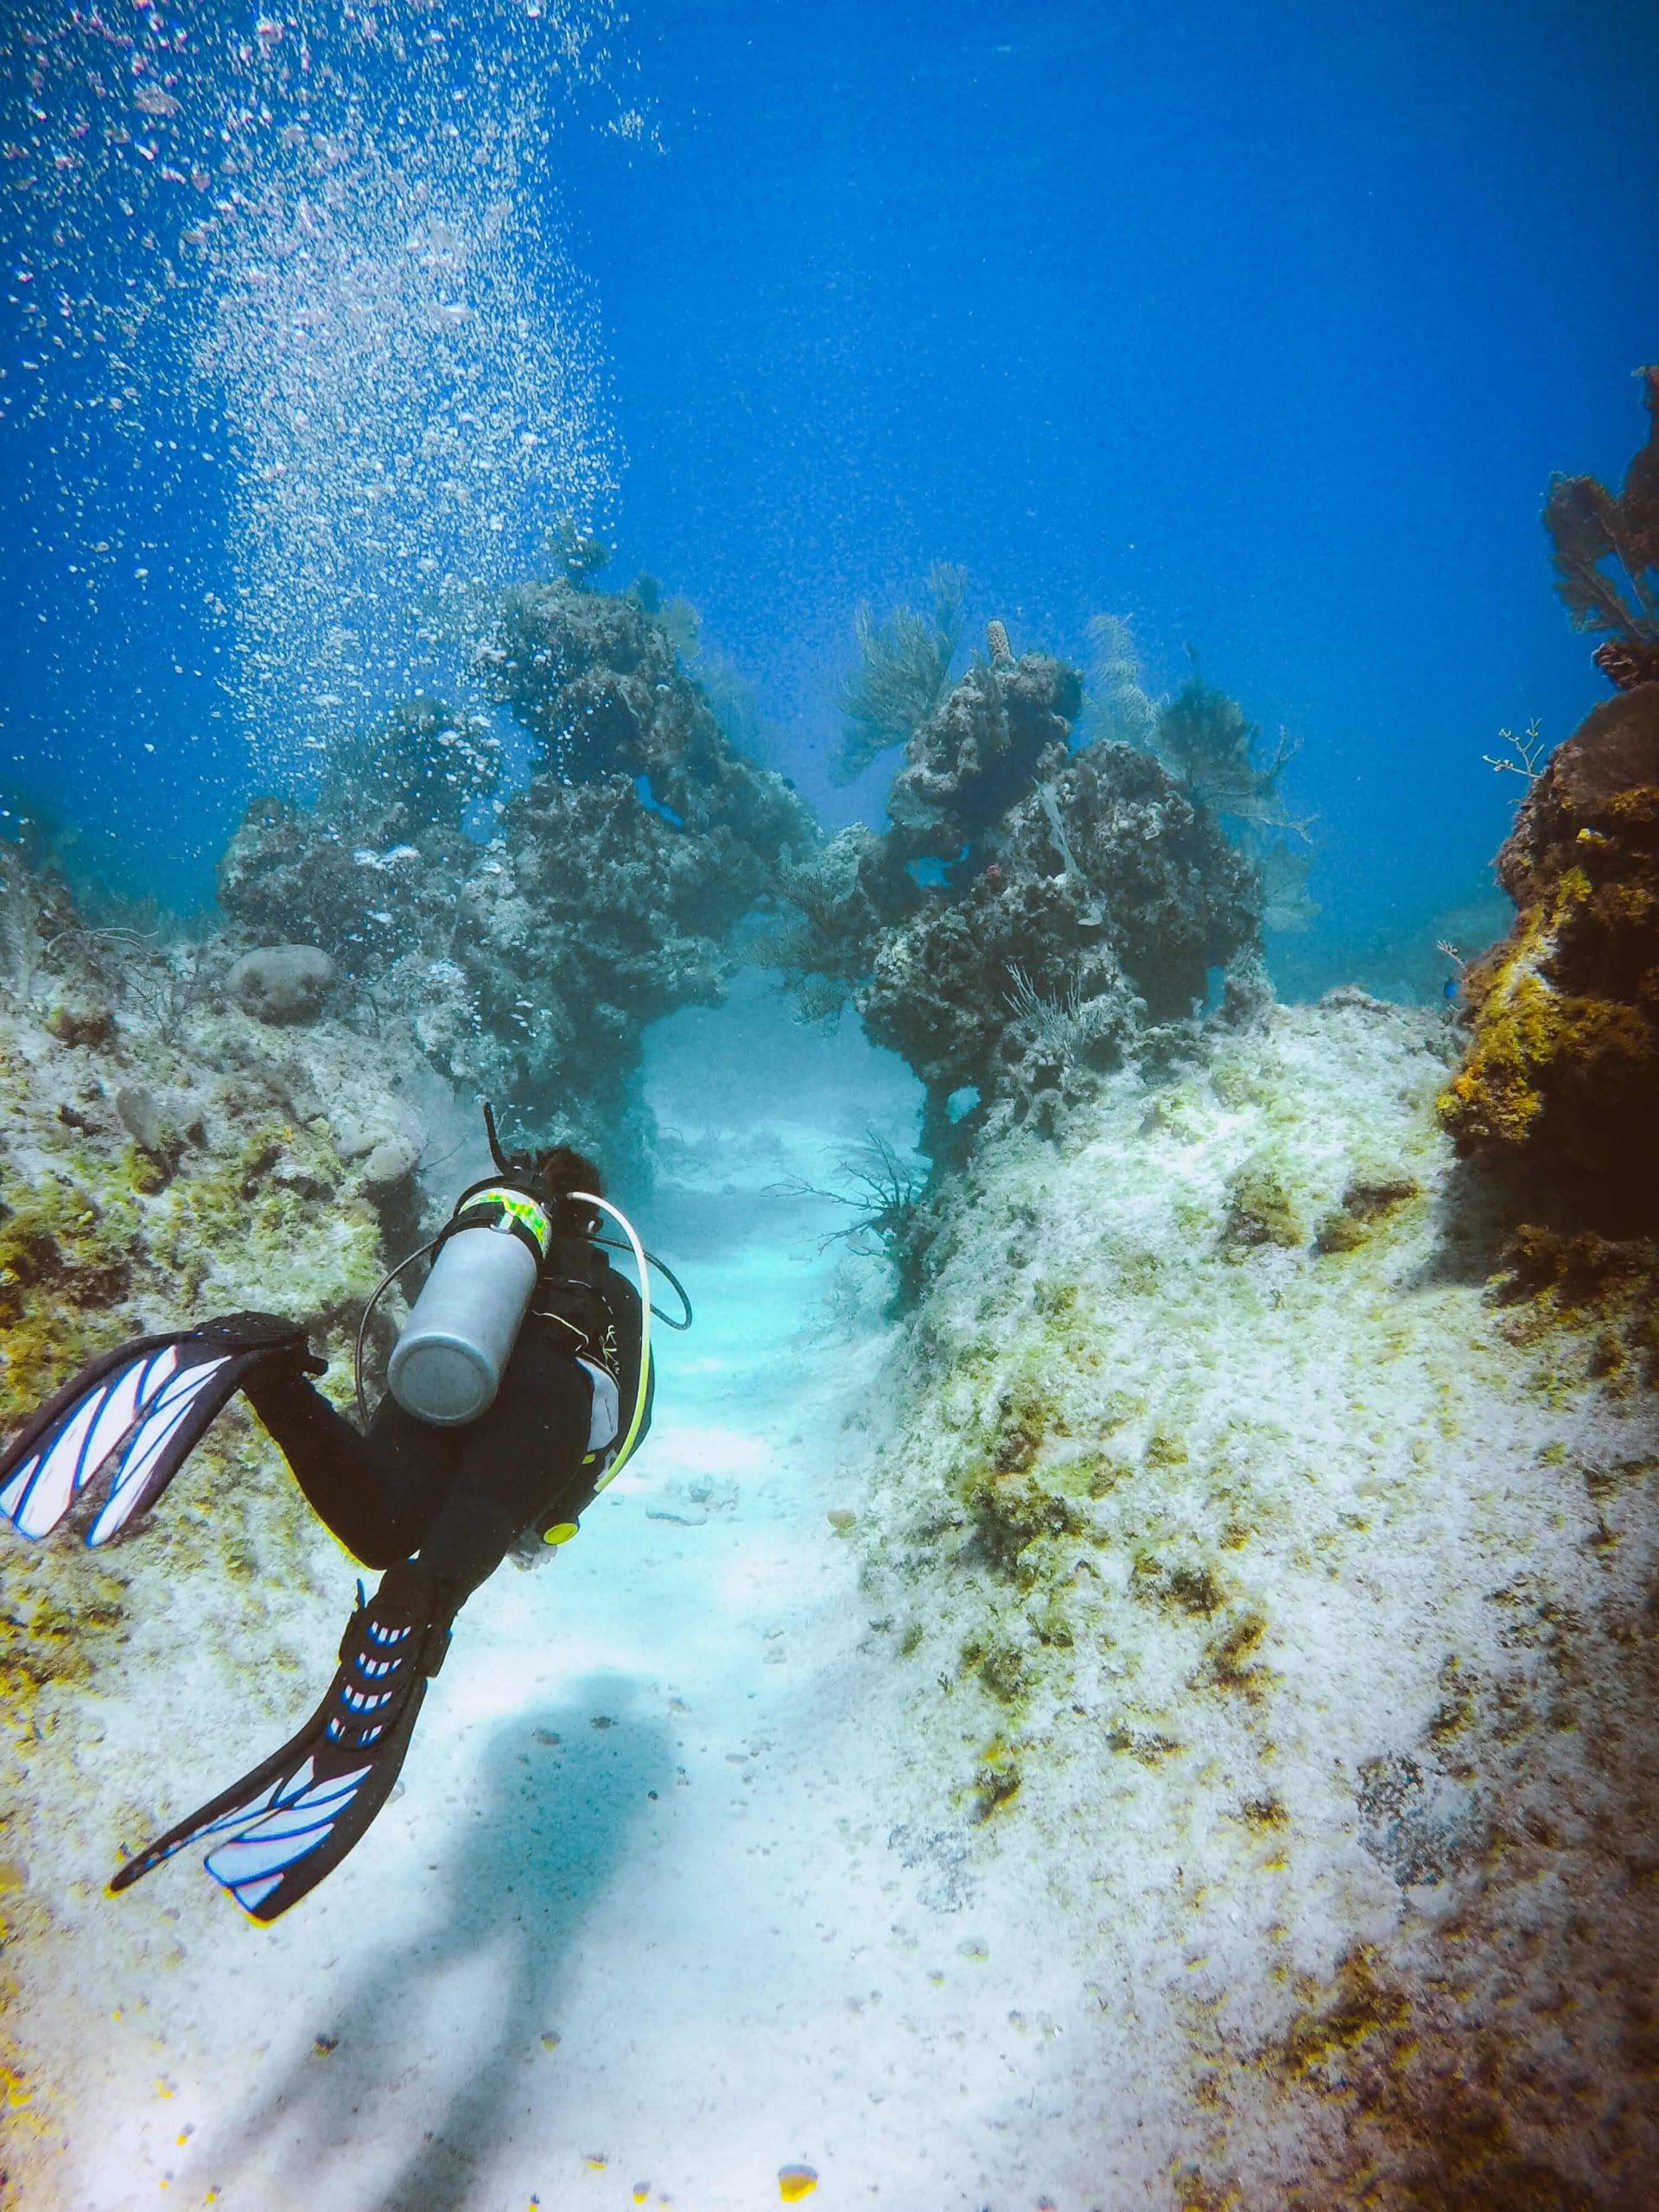 Cayman Islands coral reef